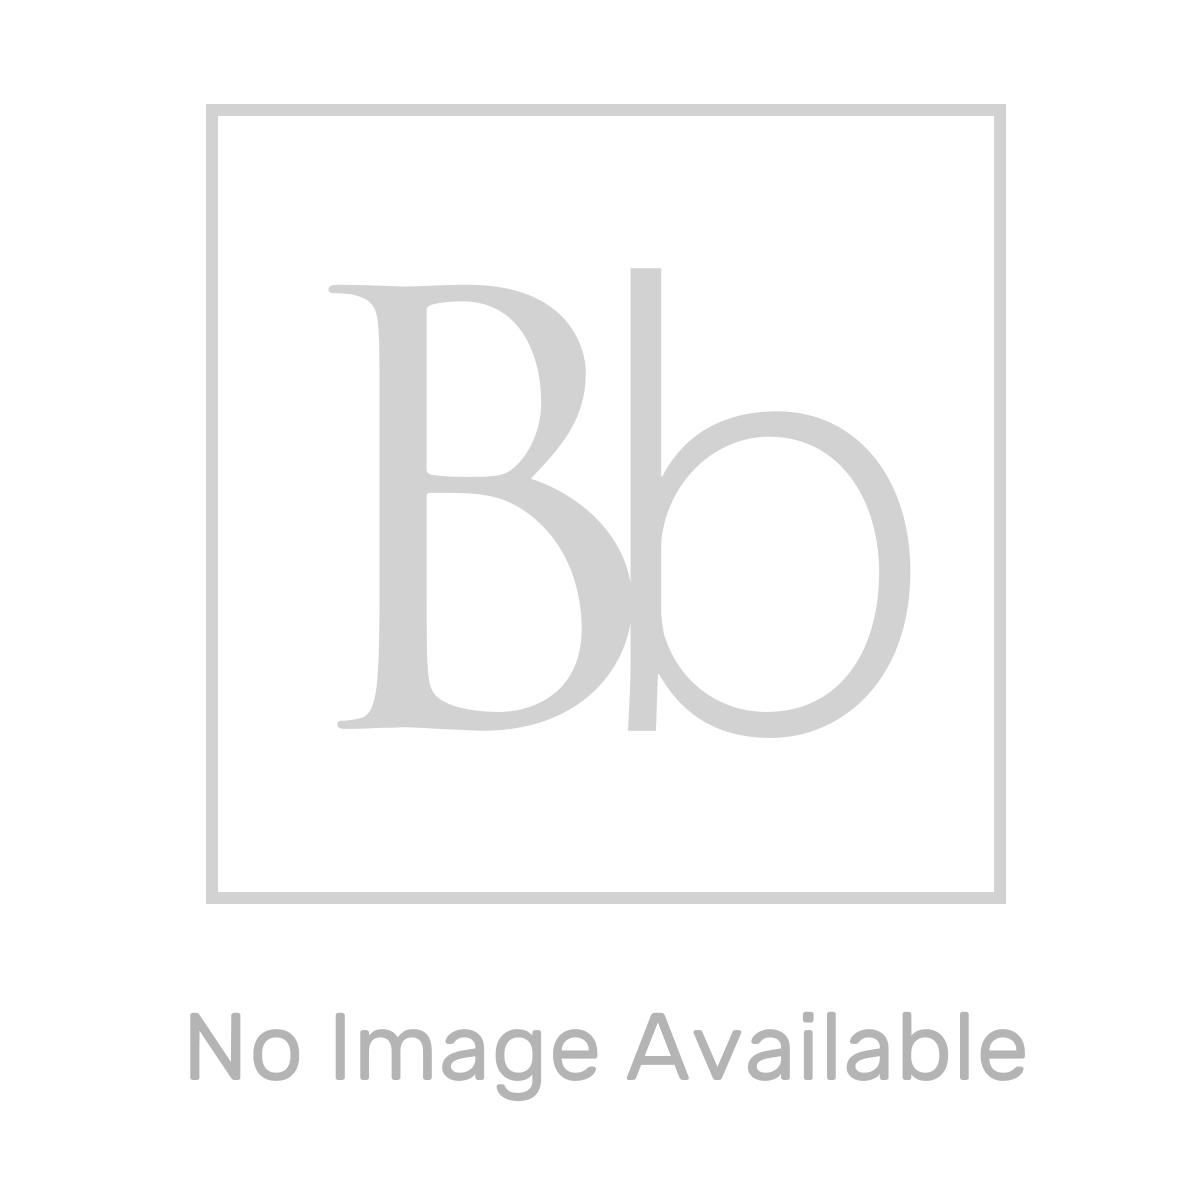 Aquadart Black Slate Shower Tray 1600 x 700 Lifestyle